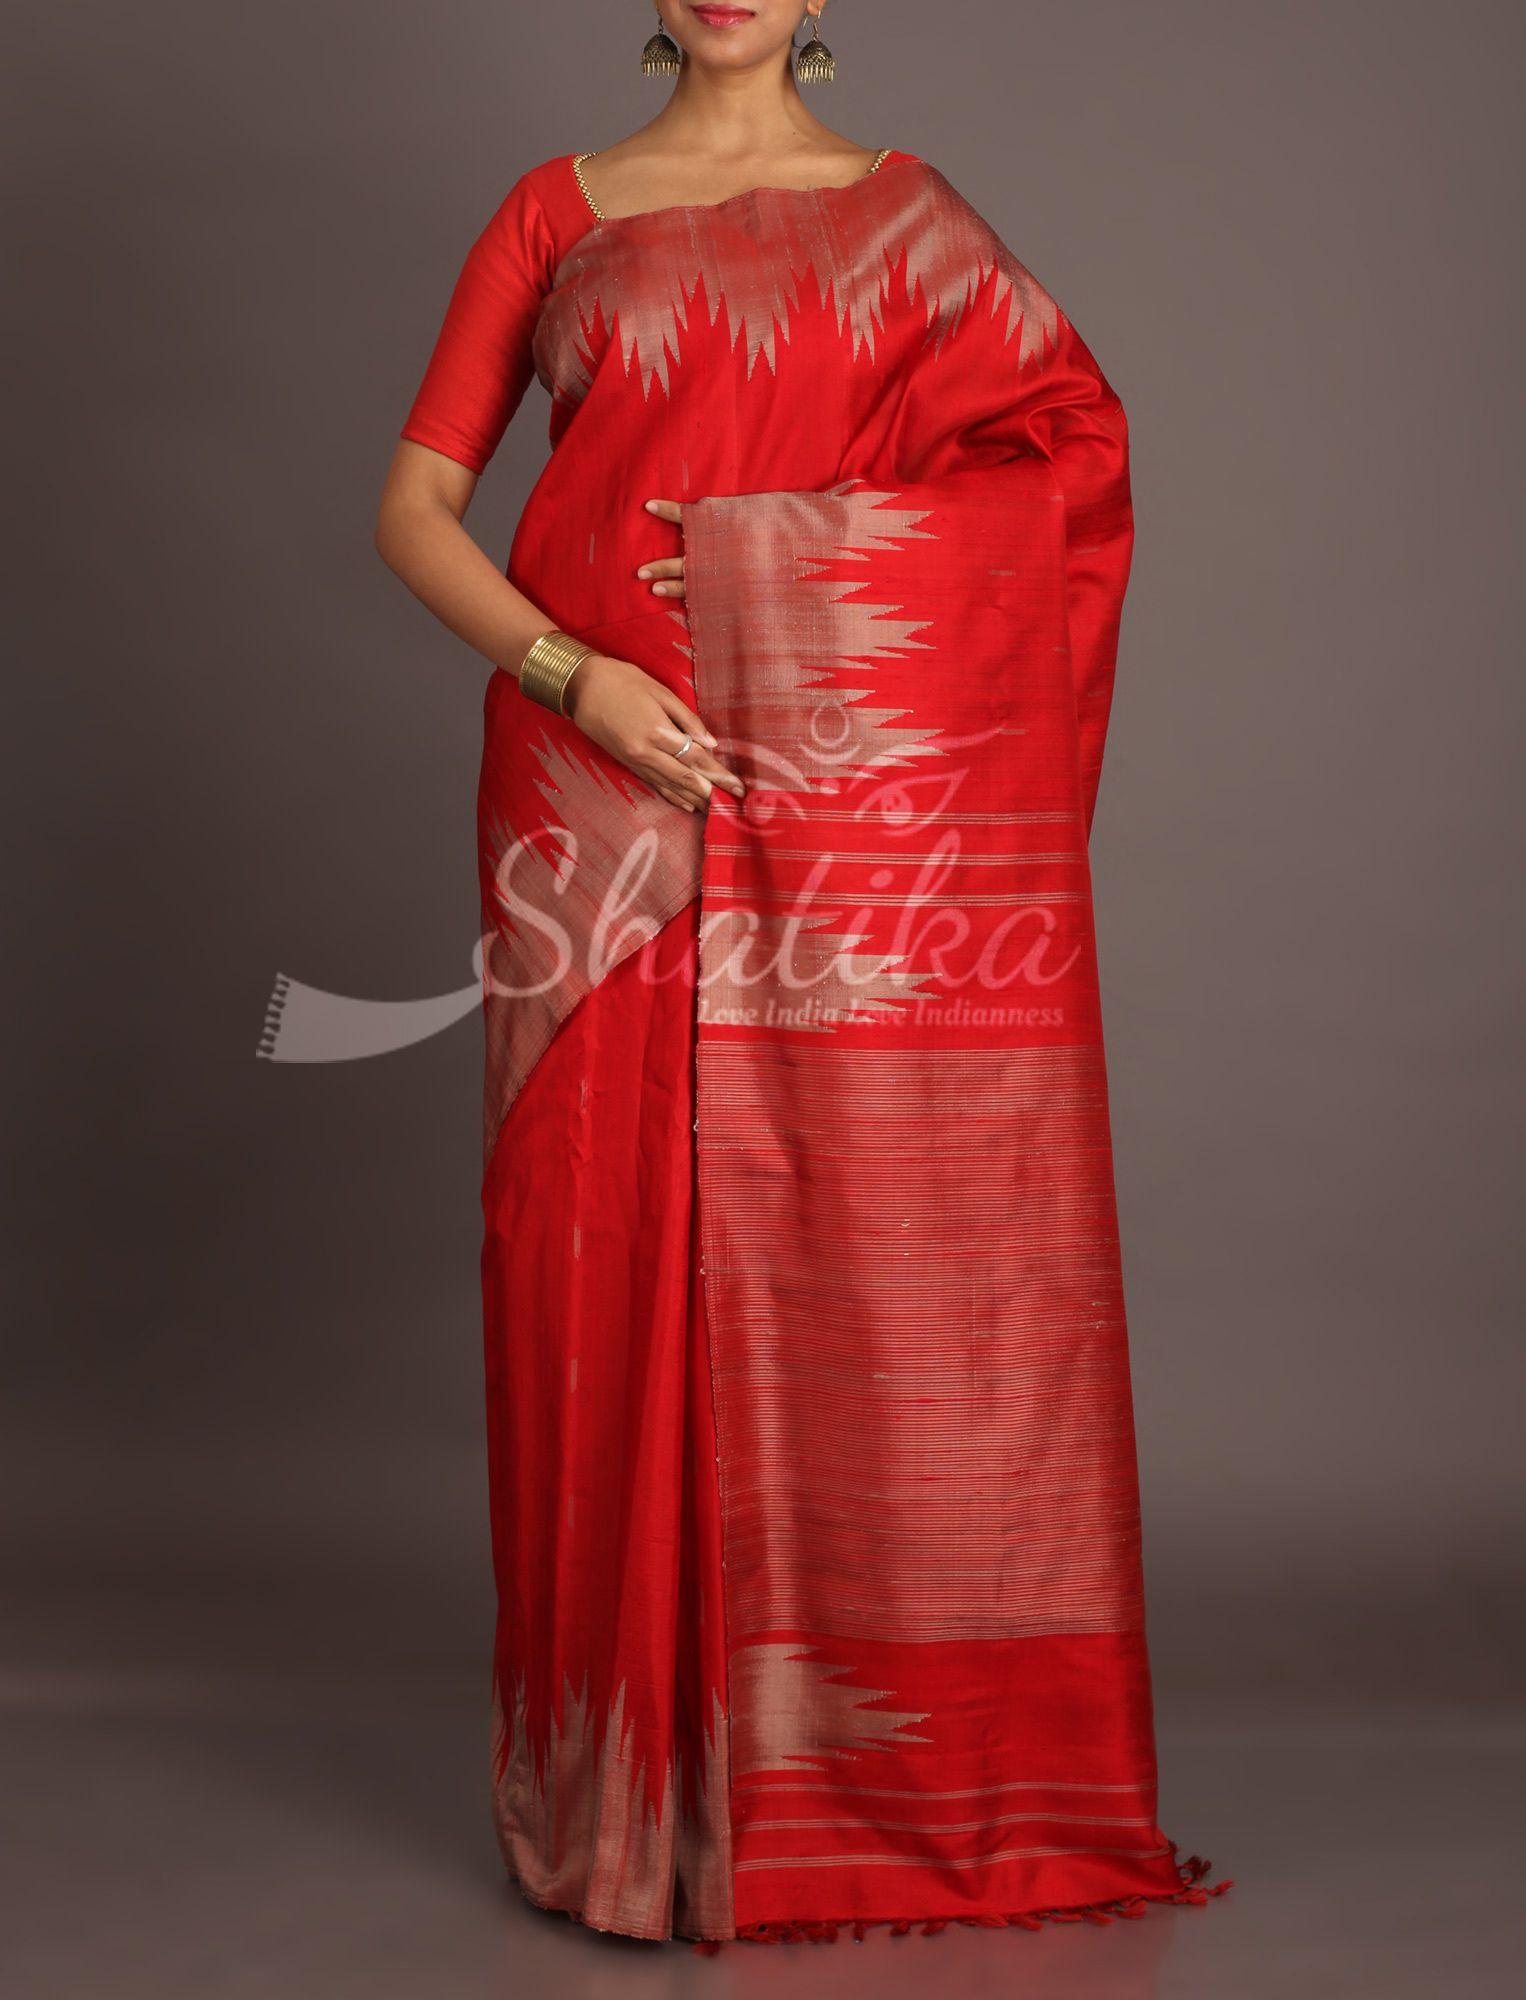 Payal Bold Red Temple Bordered Ravishing Jute Silk Saree Jute Silk Saree Silk Sarees Online Shopping Cotton Sarees Online